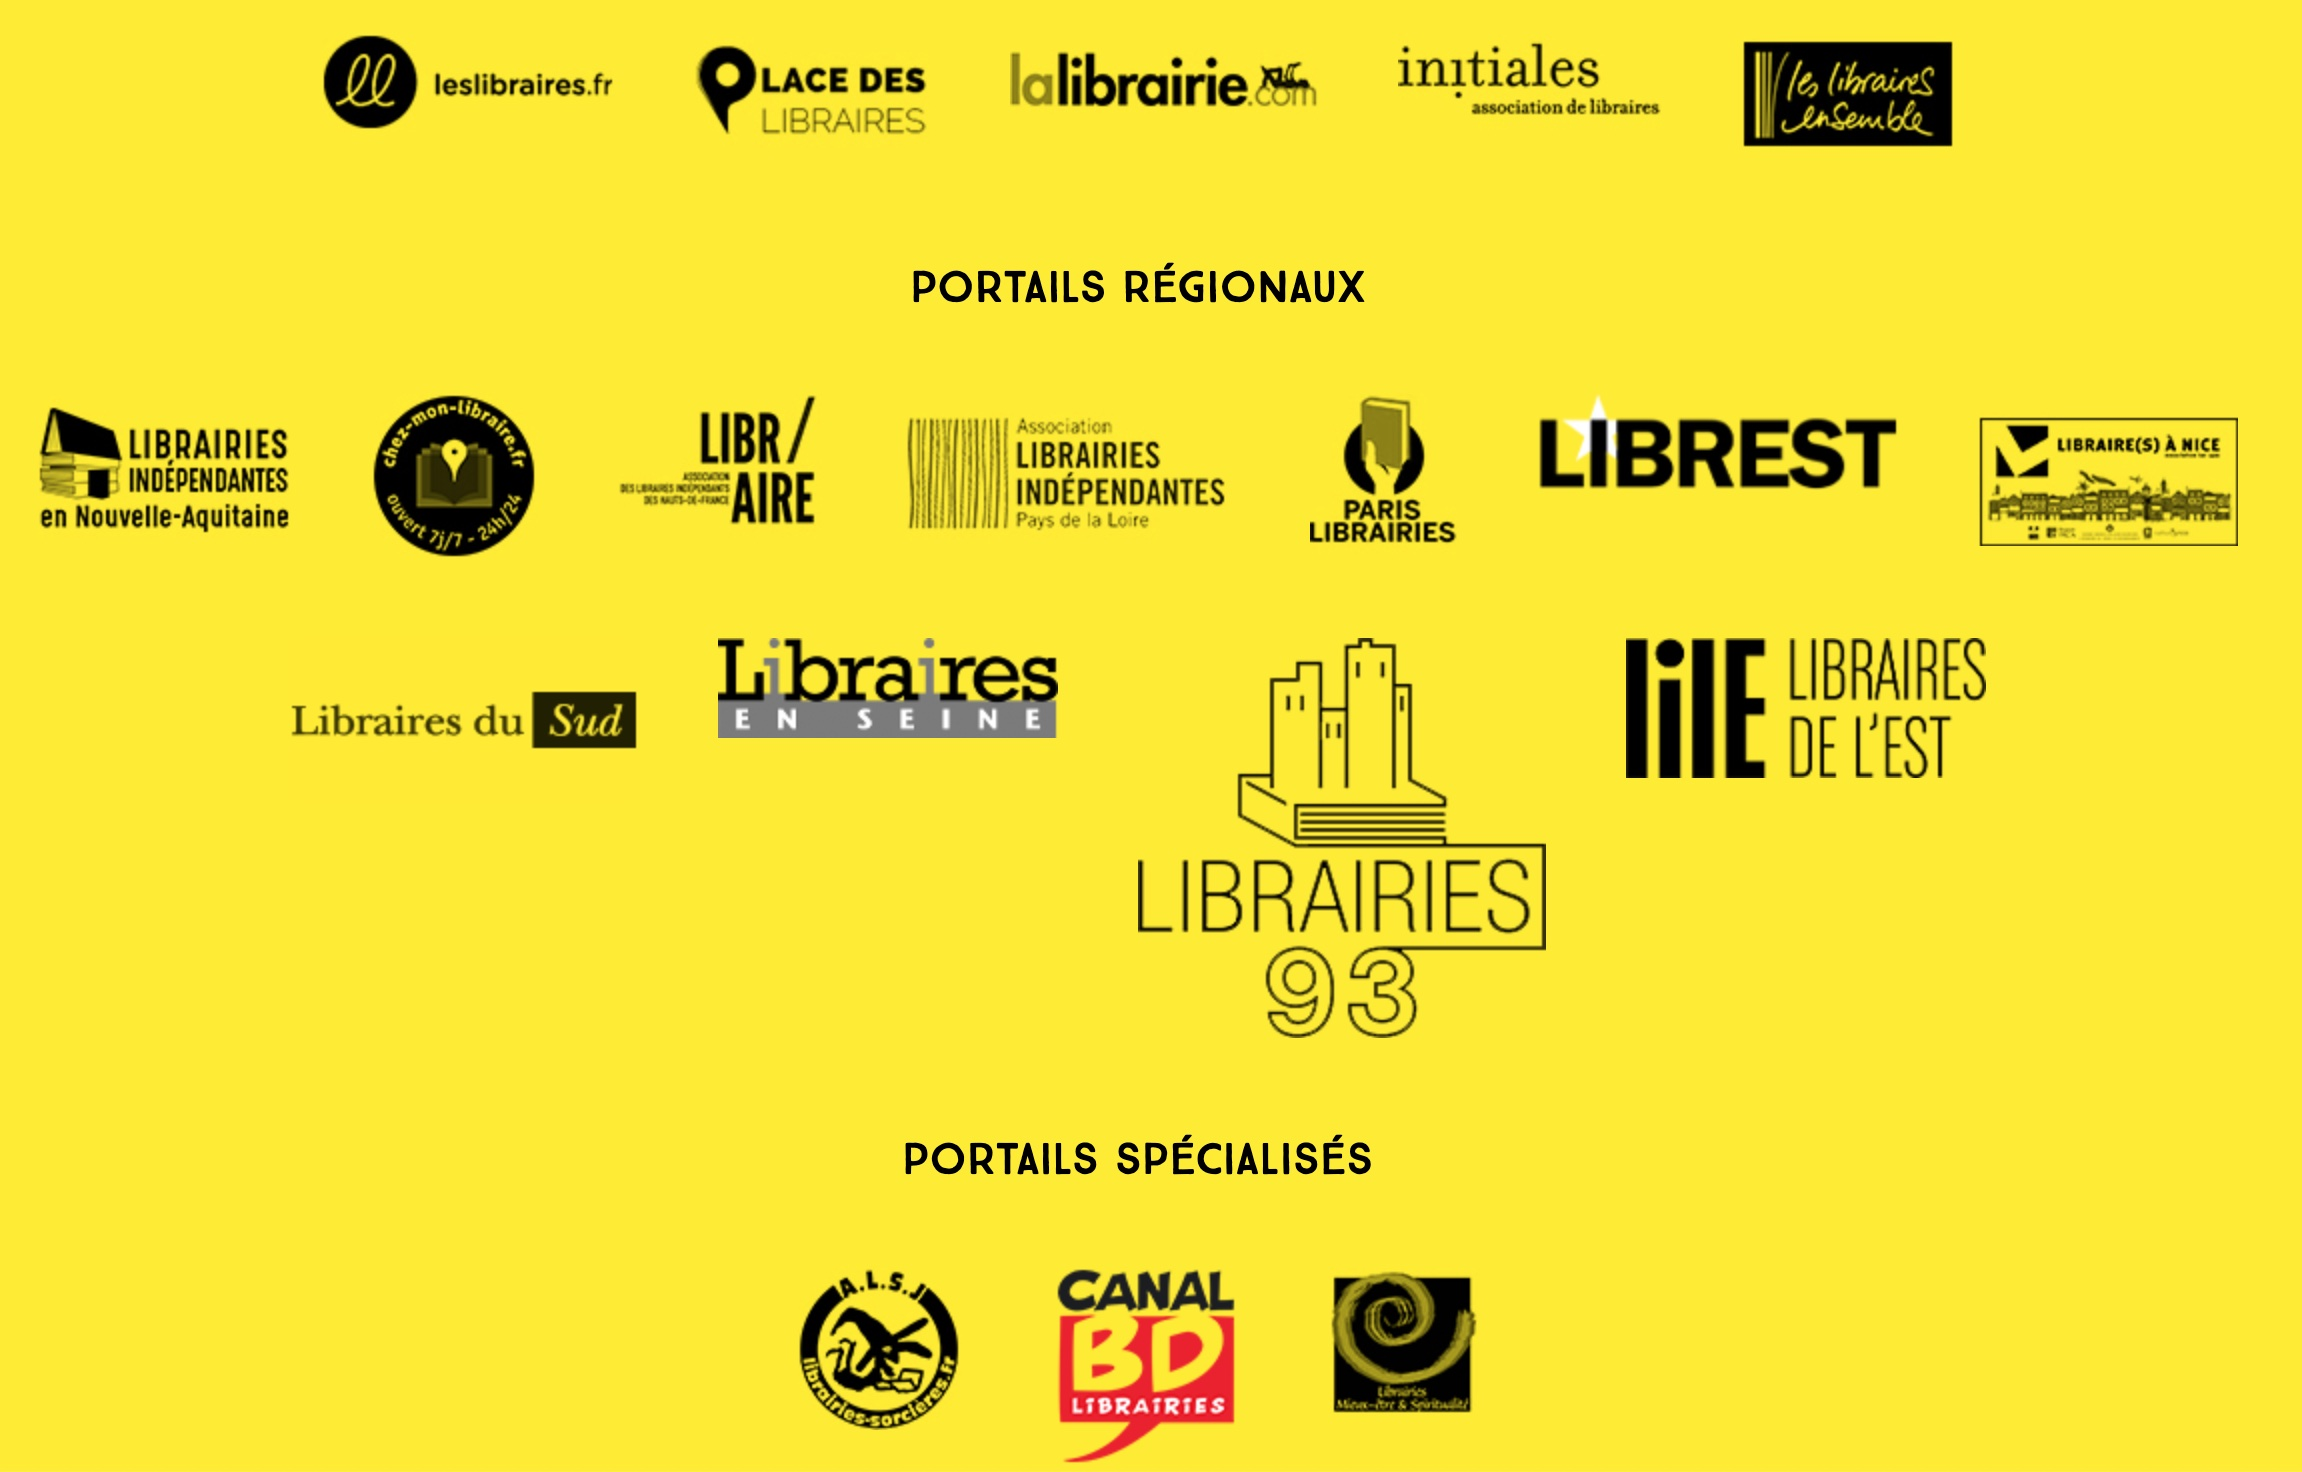 librairies-independantes